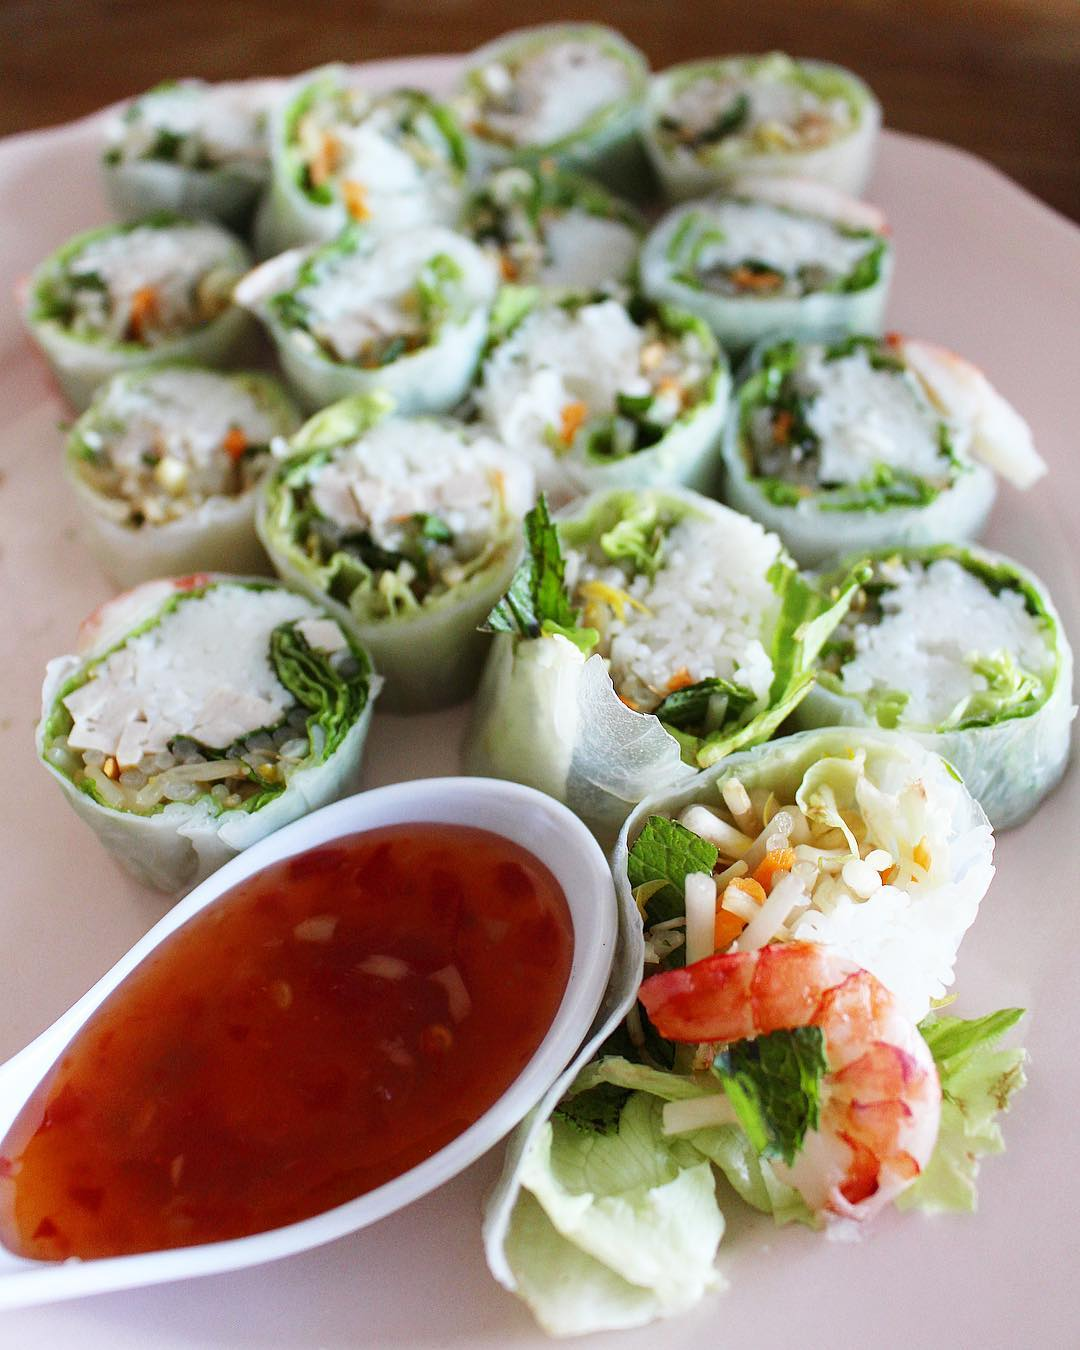 Home made with Love ❤️?? .  ______________ #springrolls #shrimps #rouleaudeprintemps #asianfood  #food #blogfood #foodlover #montpellier #pintademontpellier